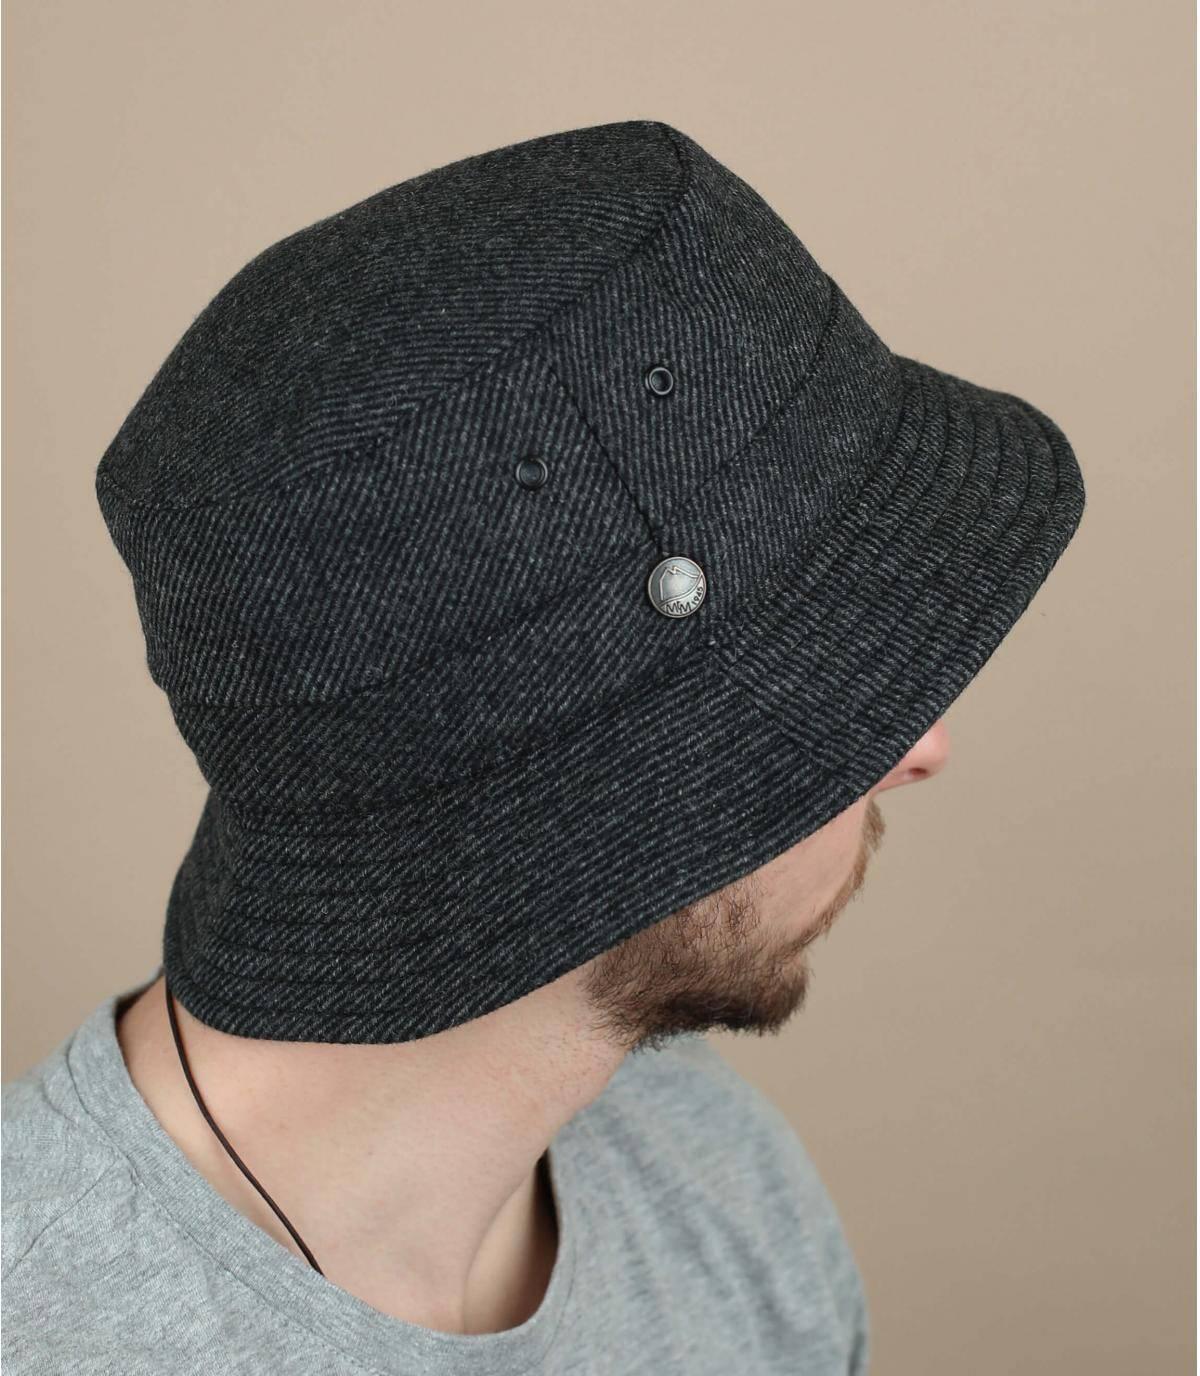 sombrero de pescador lana reciclada gris